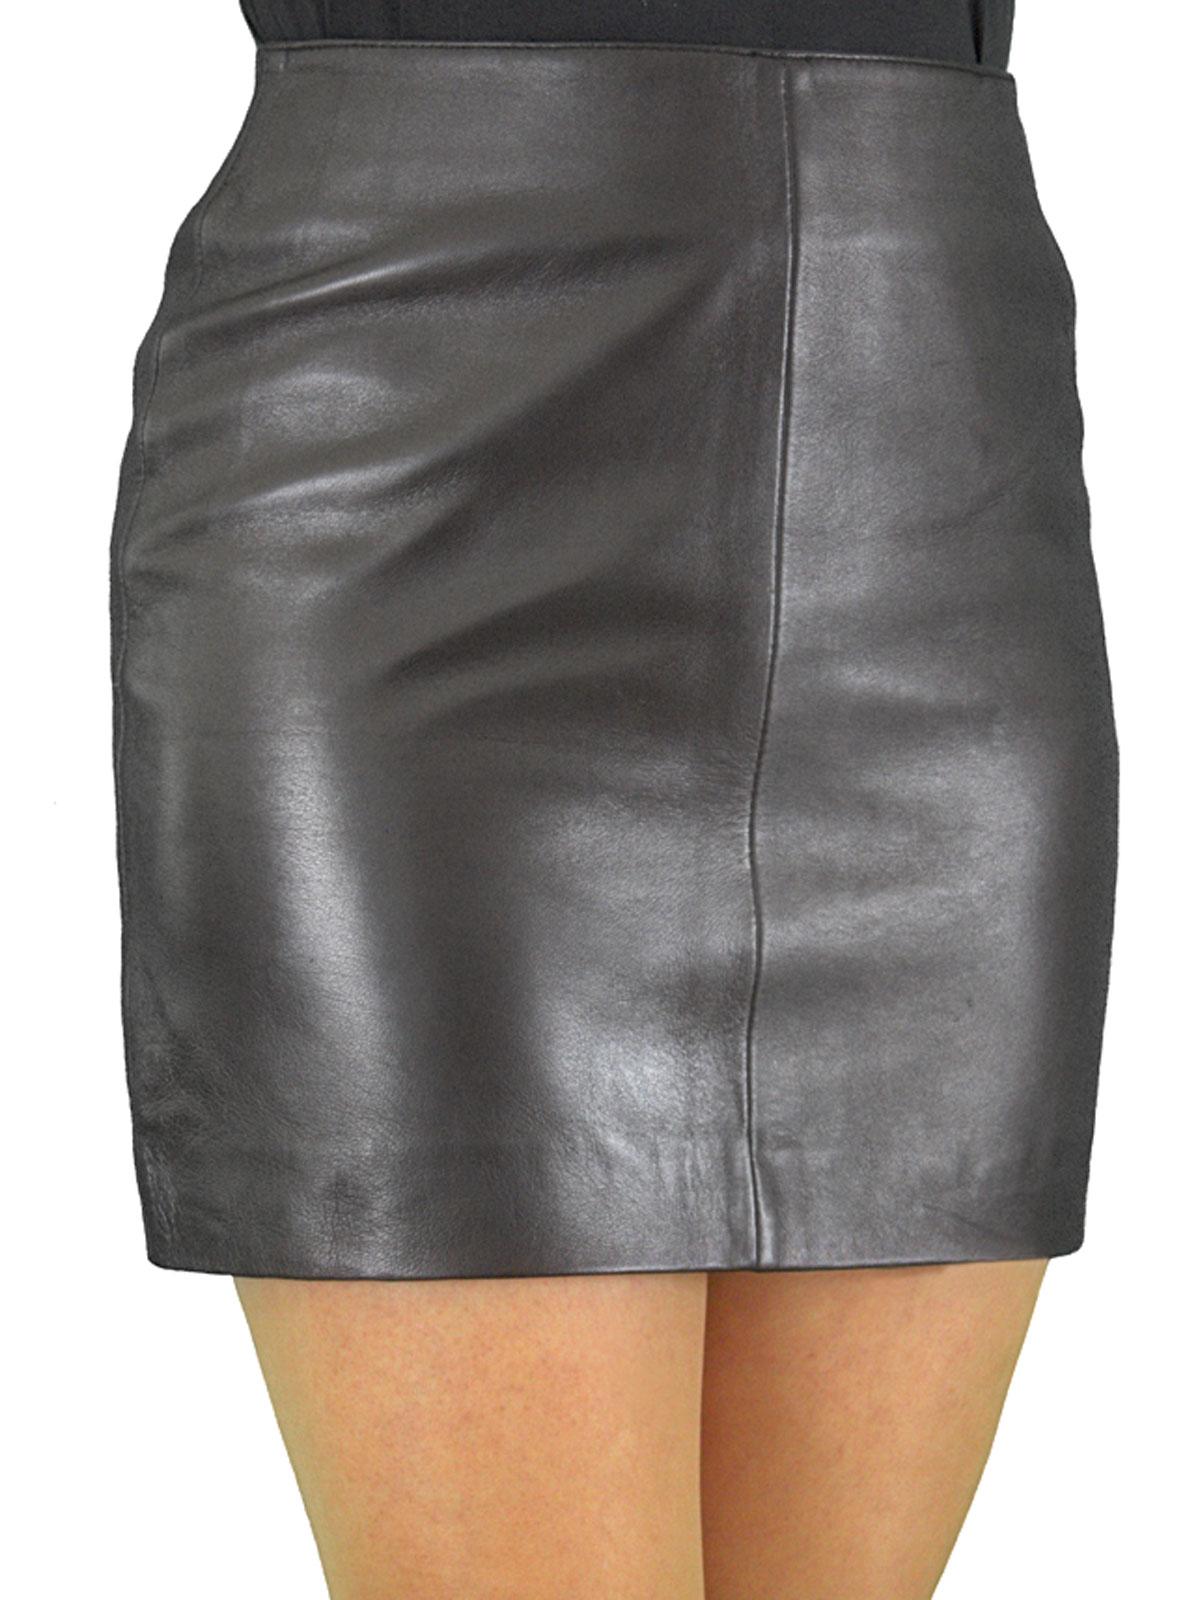 Soft Leather Mini Skirt with Full Rear Zip - Tout Ensemble